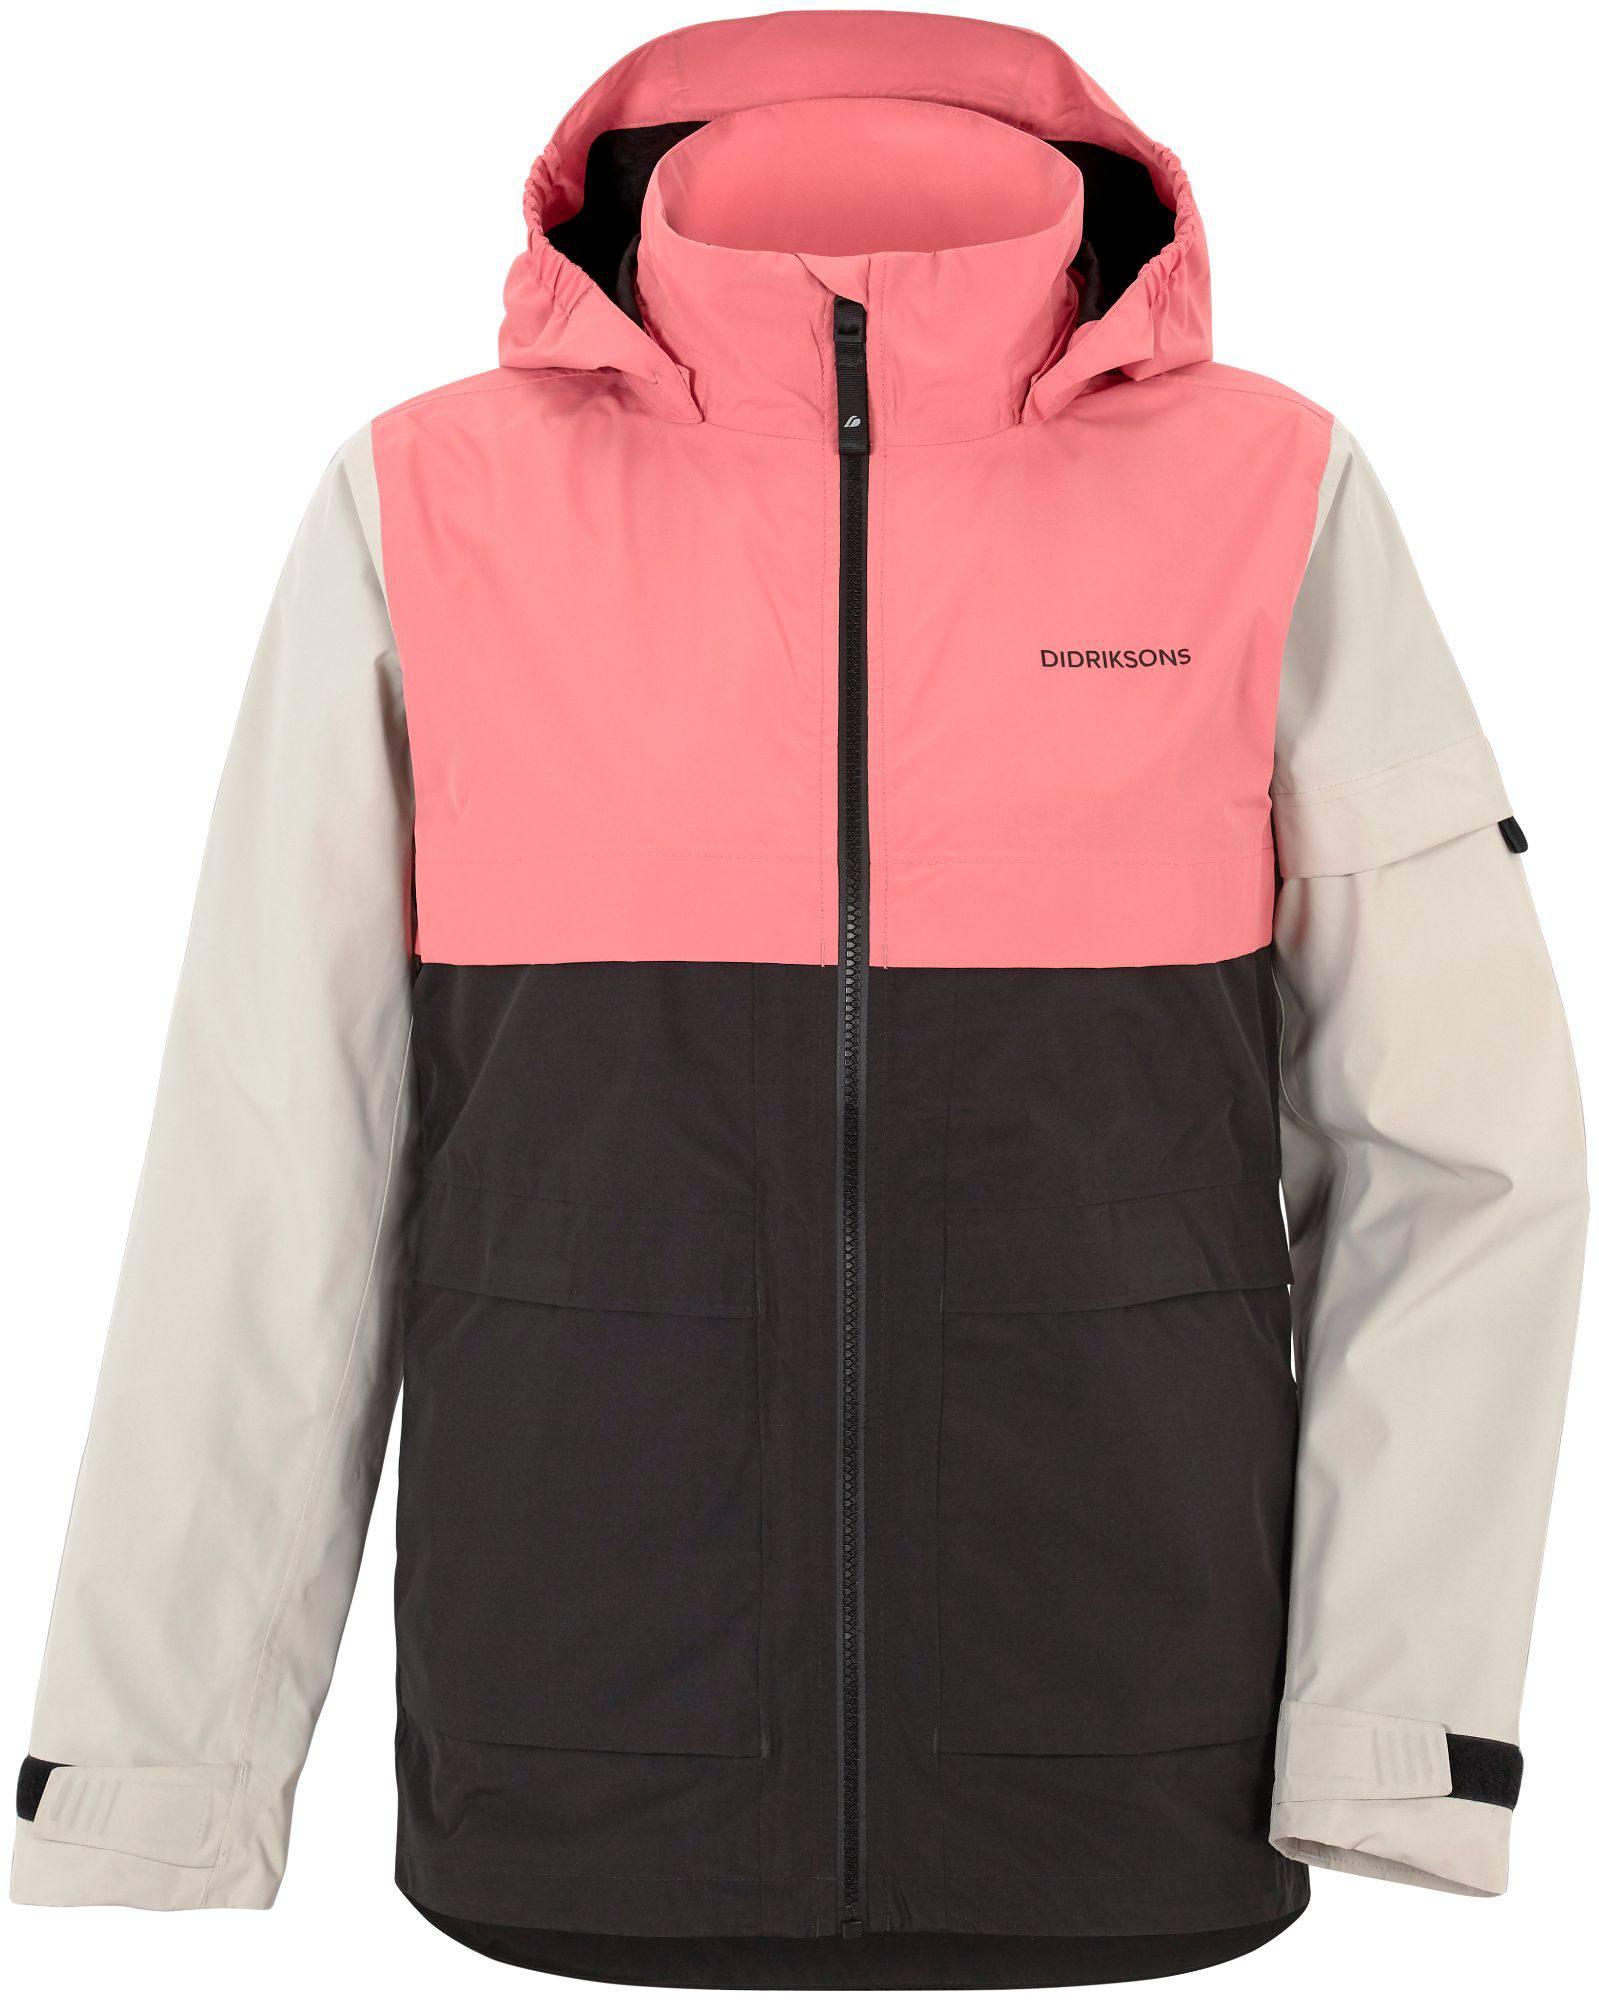 Bates Youth Jacket Pink Rose 160